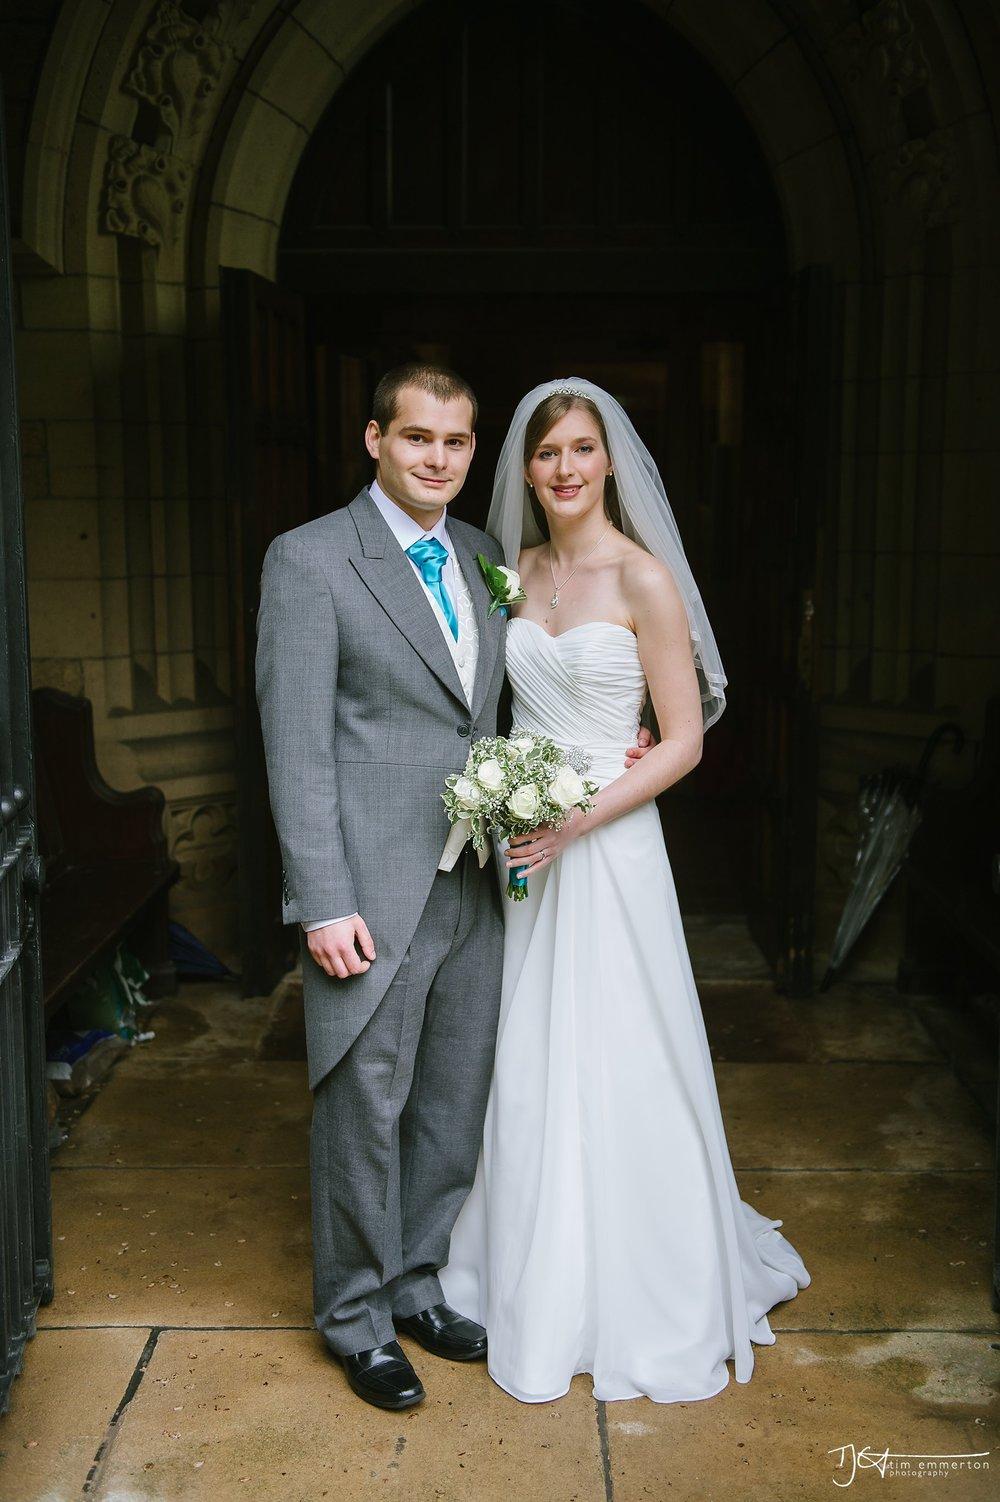 Emma & Rudy Wedding Photographs - Astley Bank-084